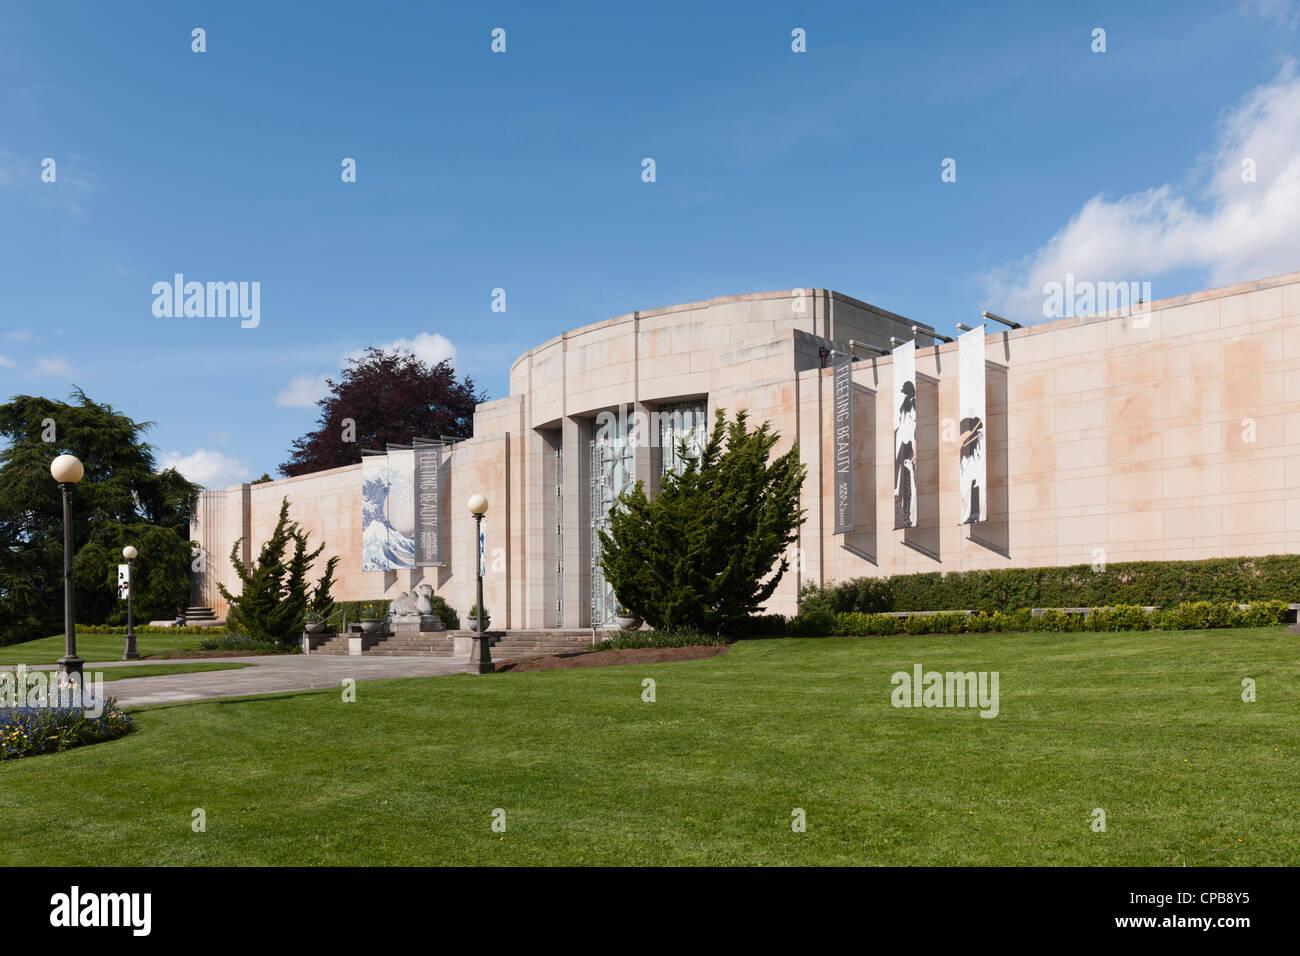 Seattle Asian Art Museum - Stock Image